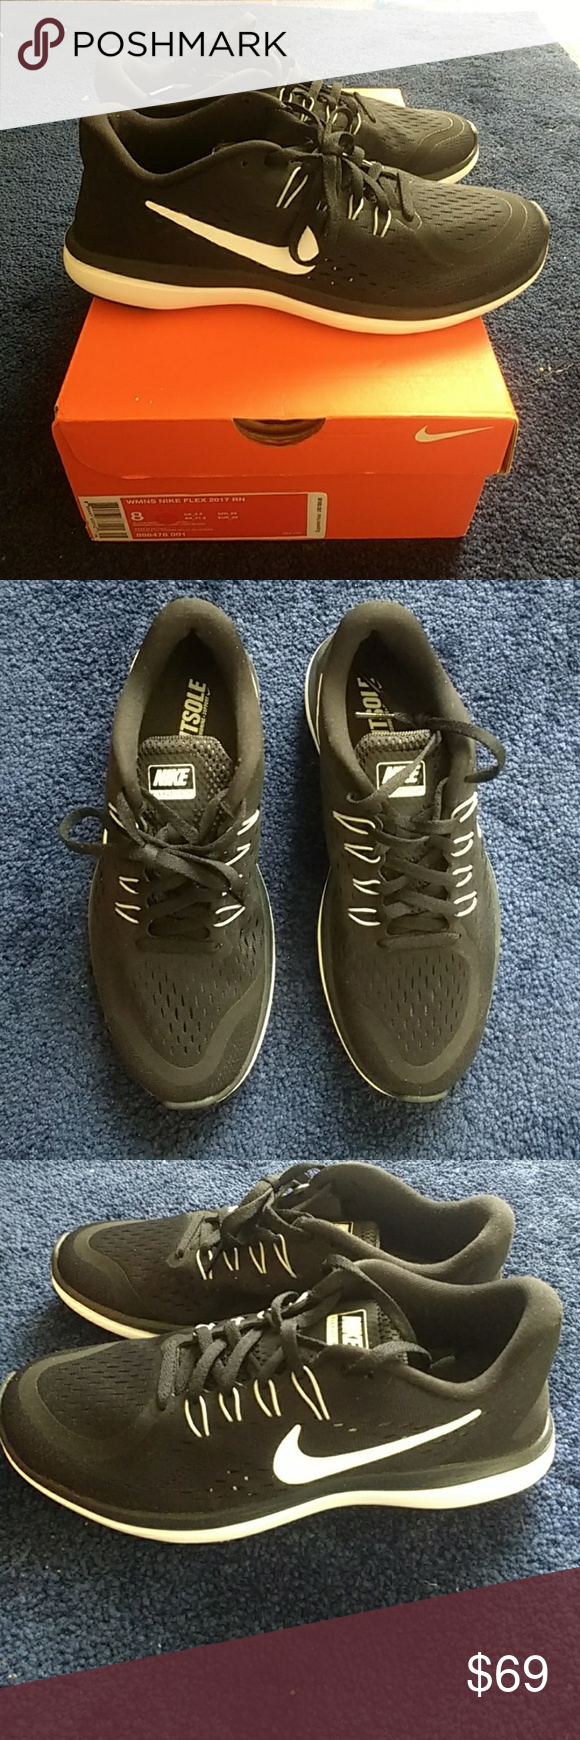 c166769e425413 NIB Nike Flex 2017 RN Women s Running Shoe Brand new in box